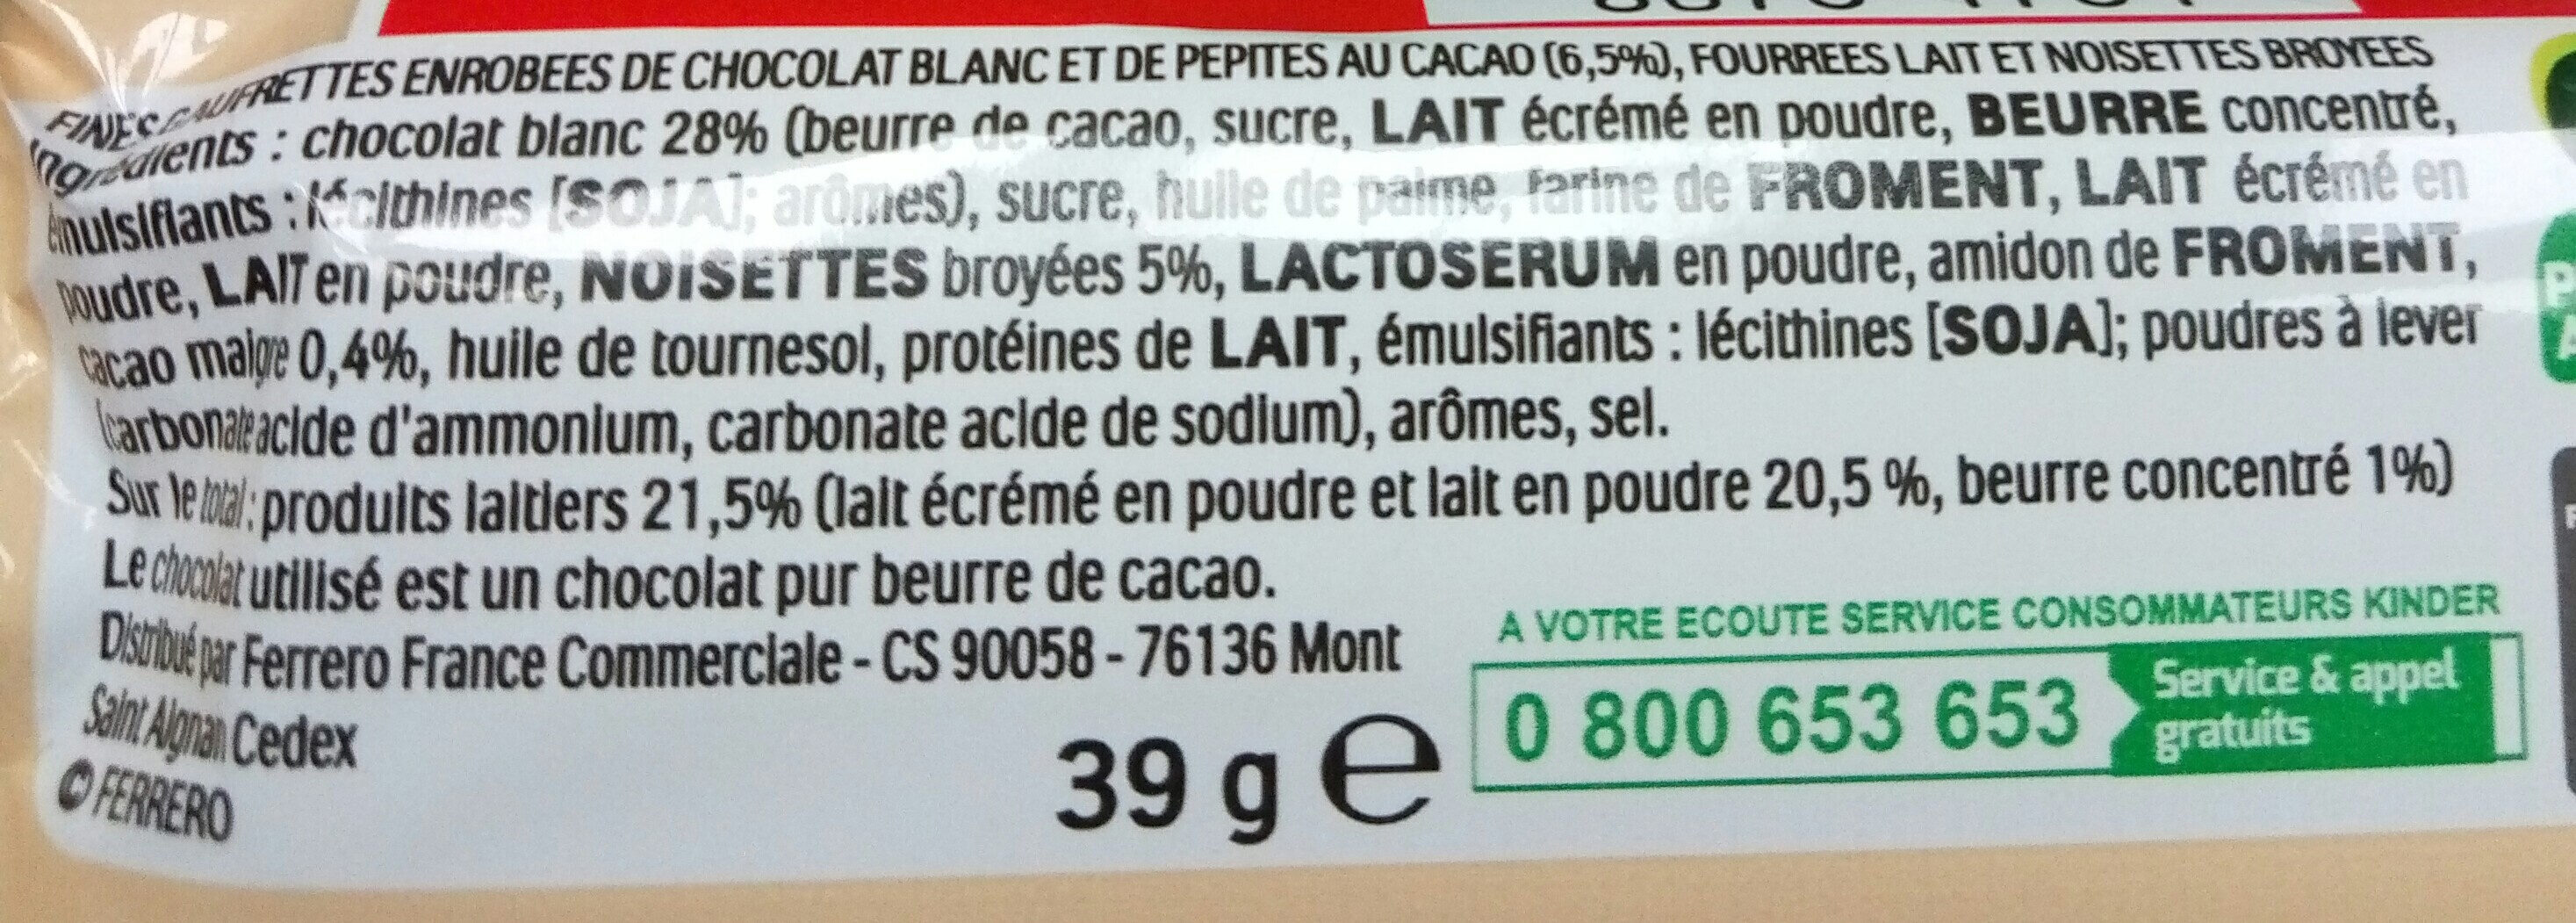 Kinder bueno white gaufrettes enrobees de chocolat blanc x2 barres - Ingredienti - fr